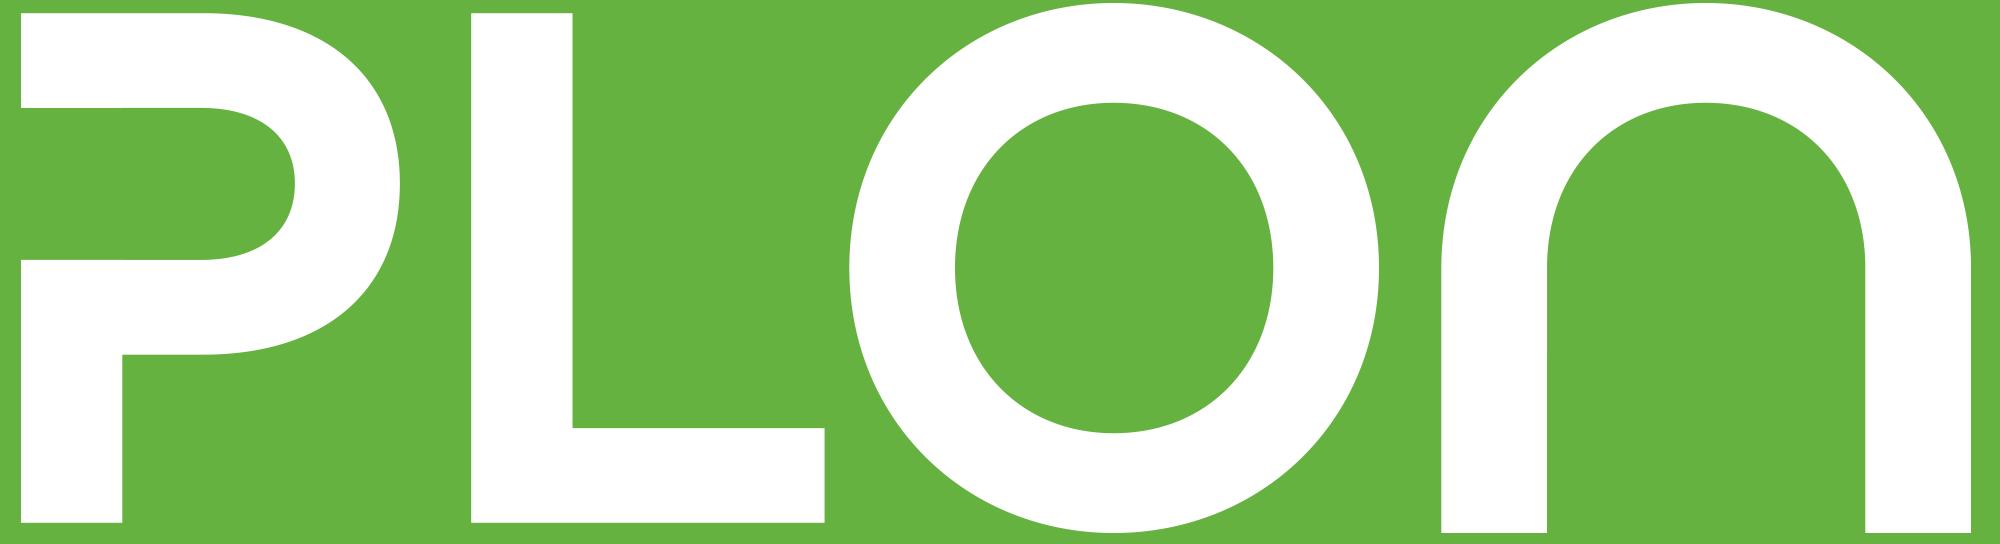 'Data Science platform